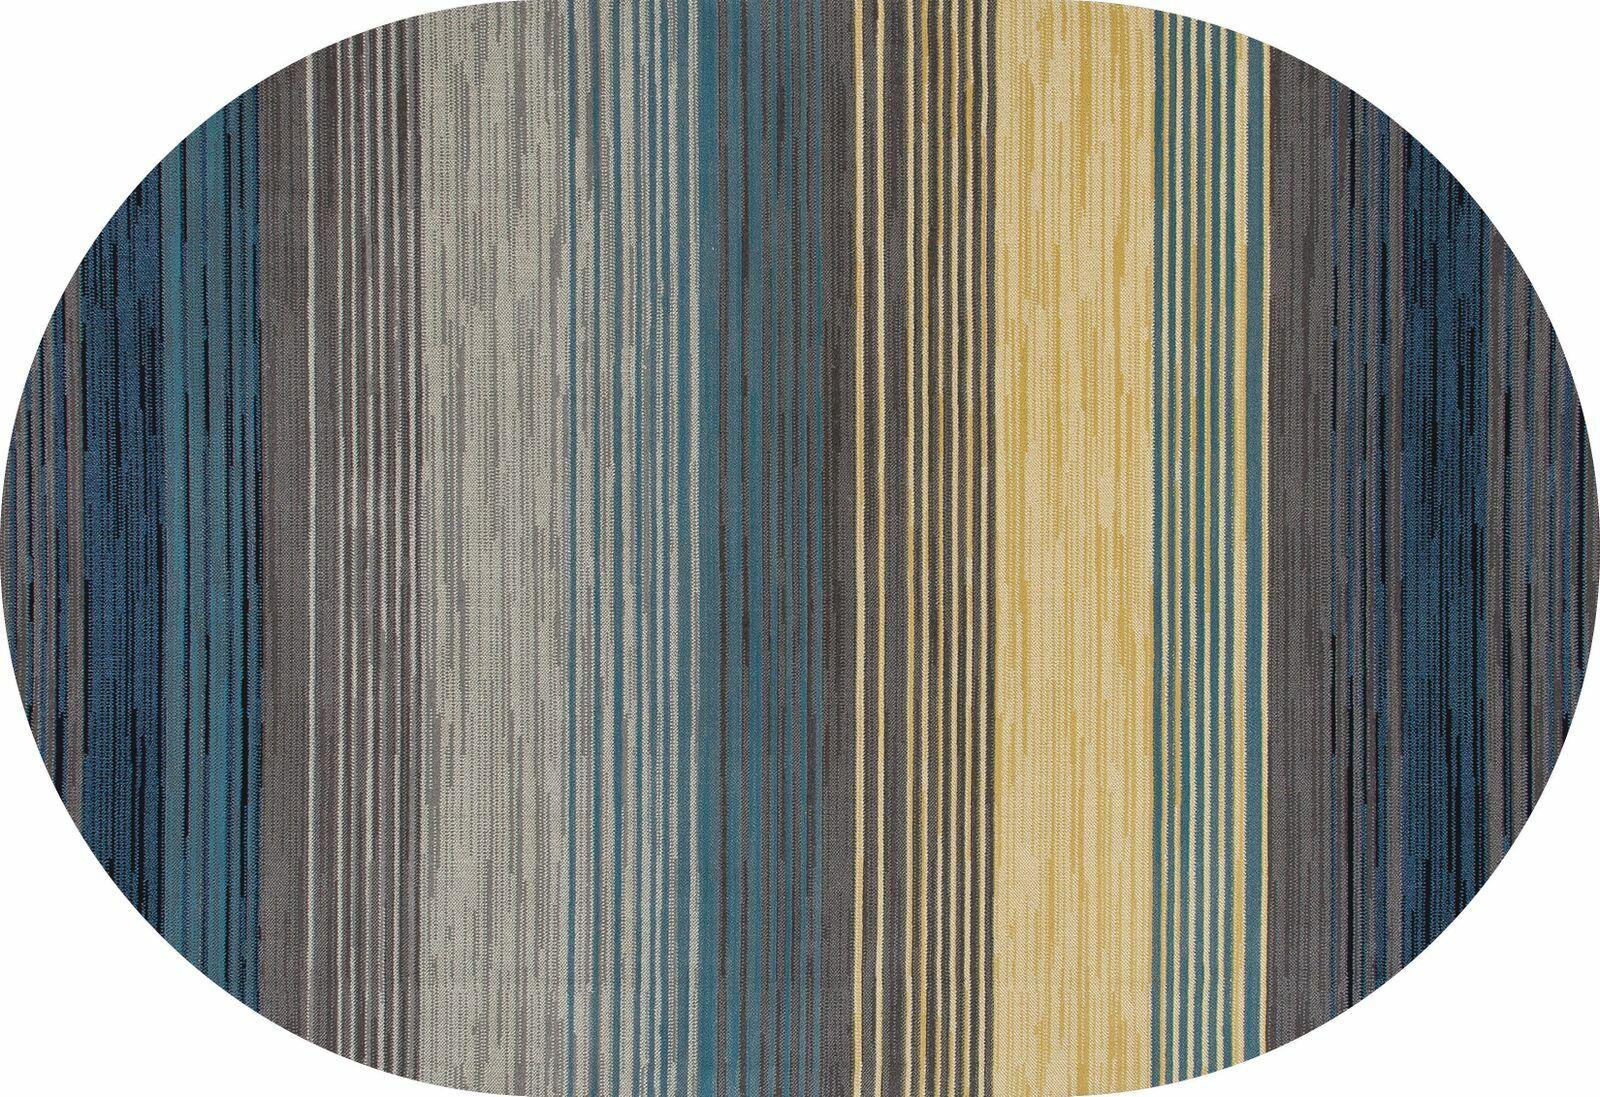 Vassallo Gray Area Rug Rug Size: OVAL 3'11 x 6'1